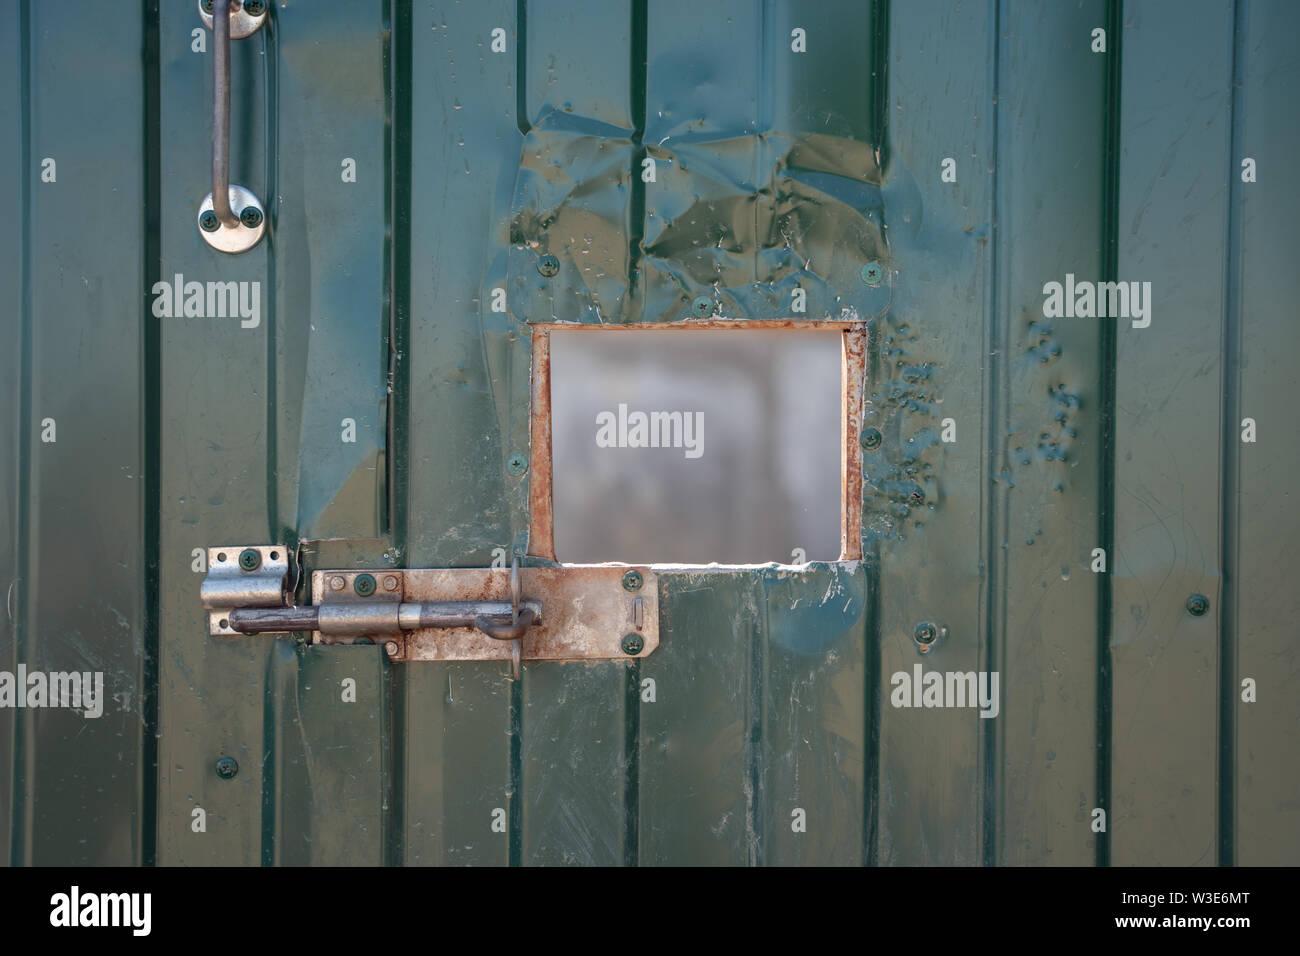 Photo of green iron door with window - Stock Image